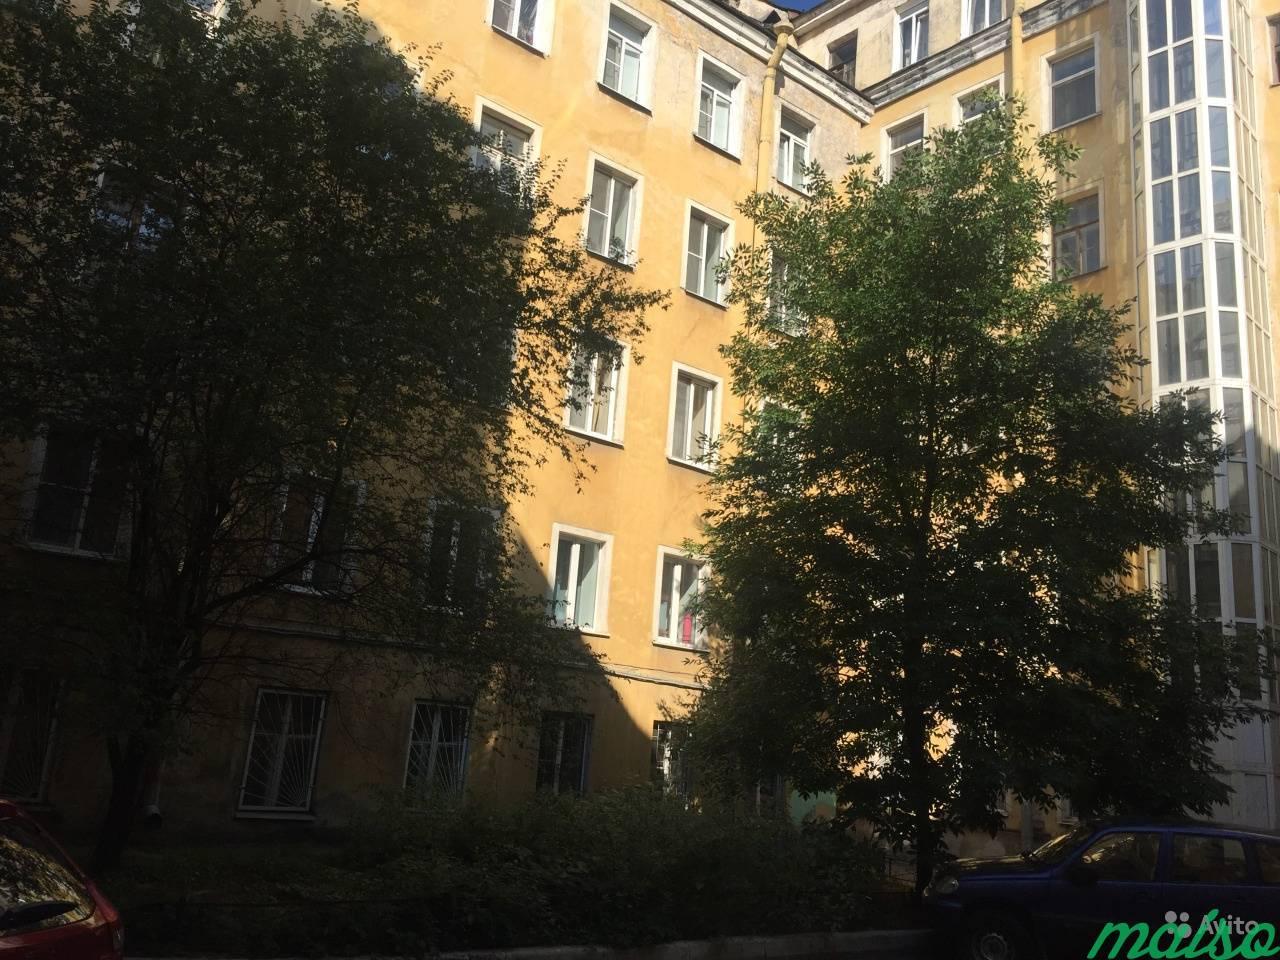 Комната 18.5 м² в 4-к, 5/6 эт. в Санкт-Петербурге. Фото 10